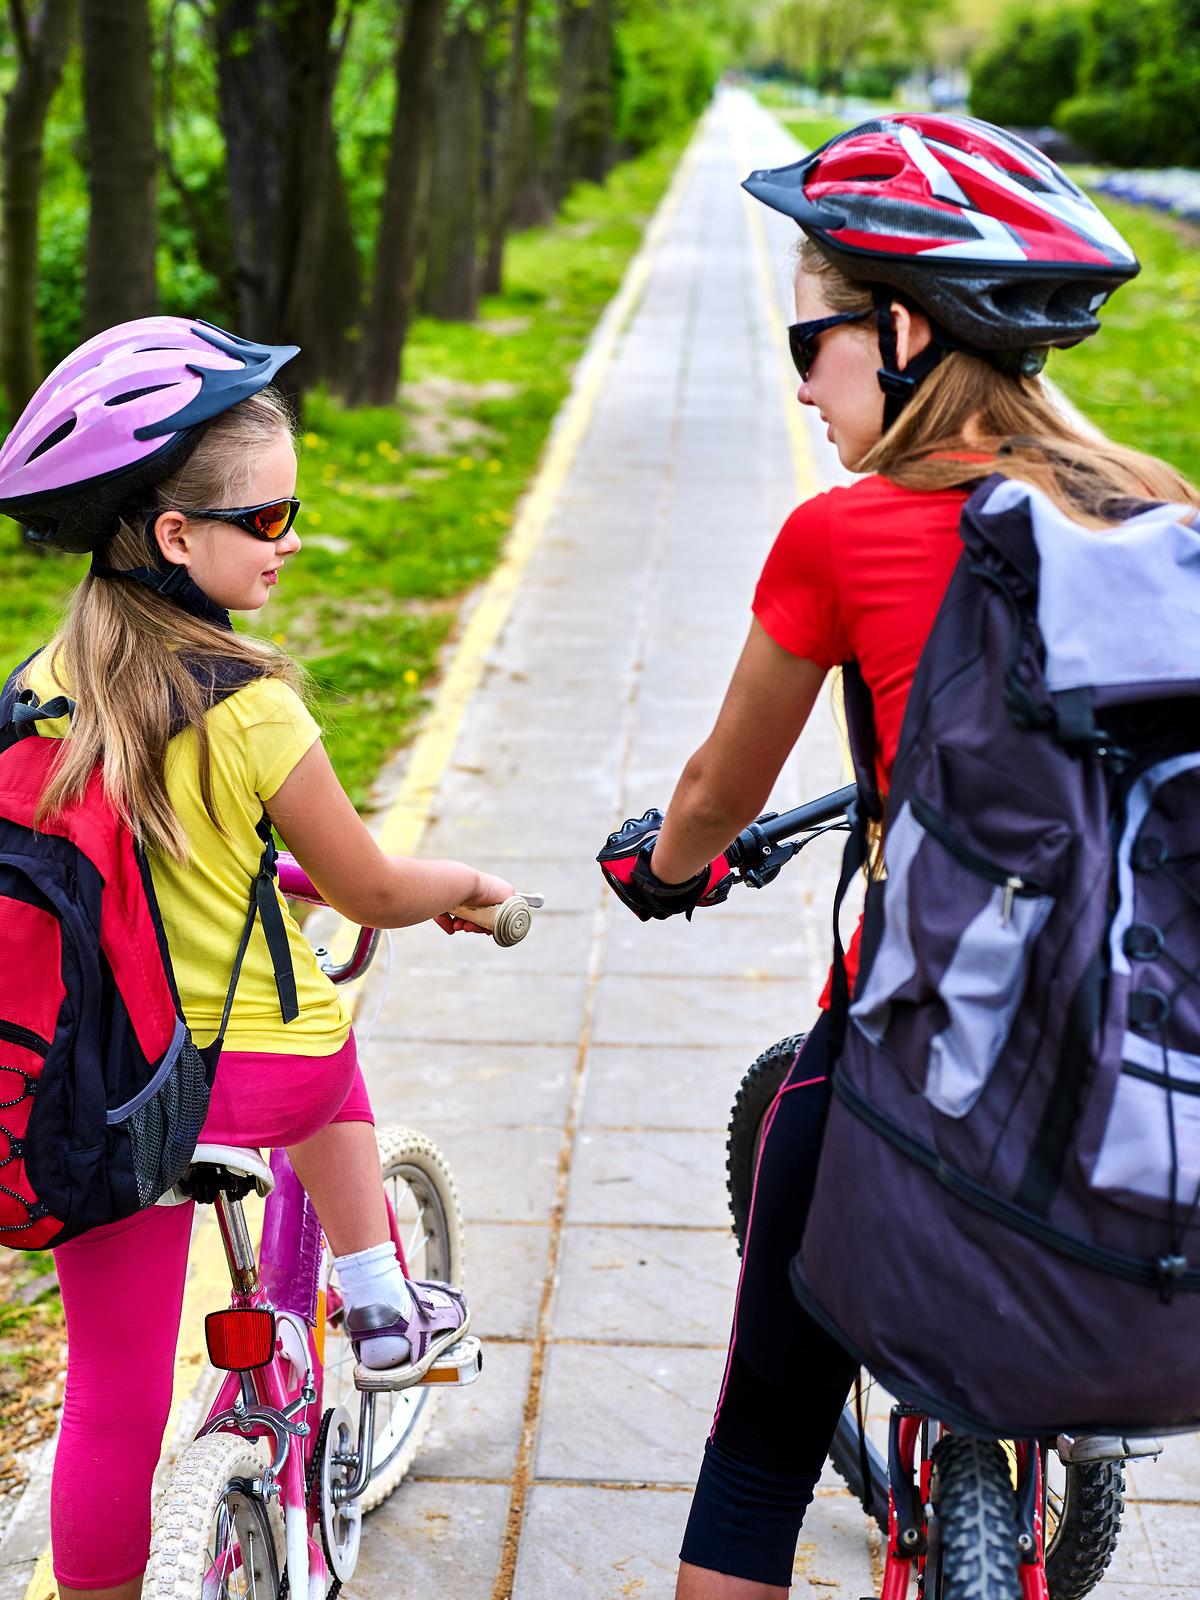 bigstock-Bicycle-path-with-children-Gi-183303220.jpg